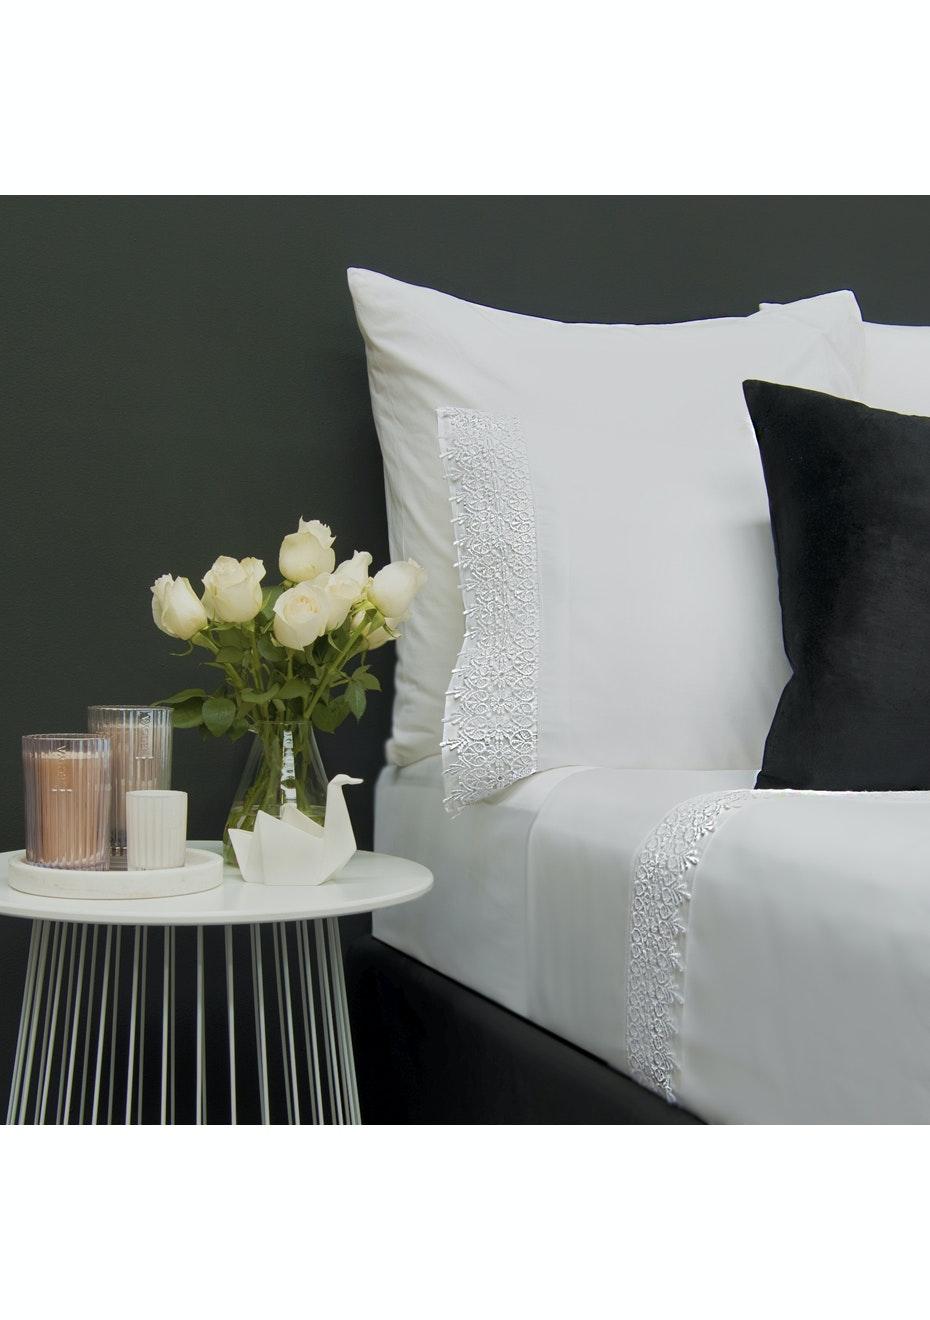 Style & Co 1000 Thread count Egyptian Cotton Hotel Collection Valencia Sheet sets Mega Queen White